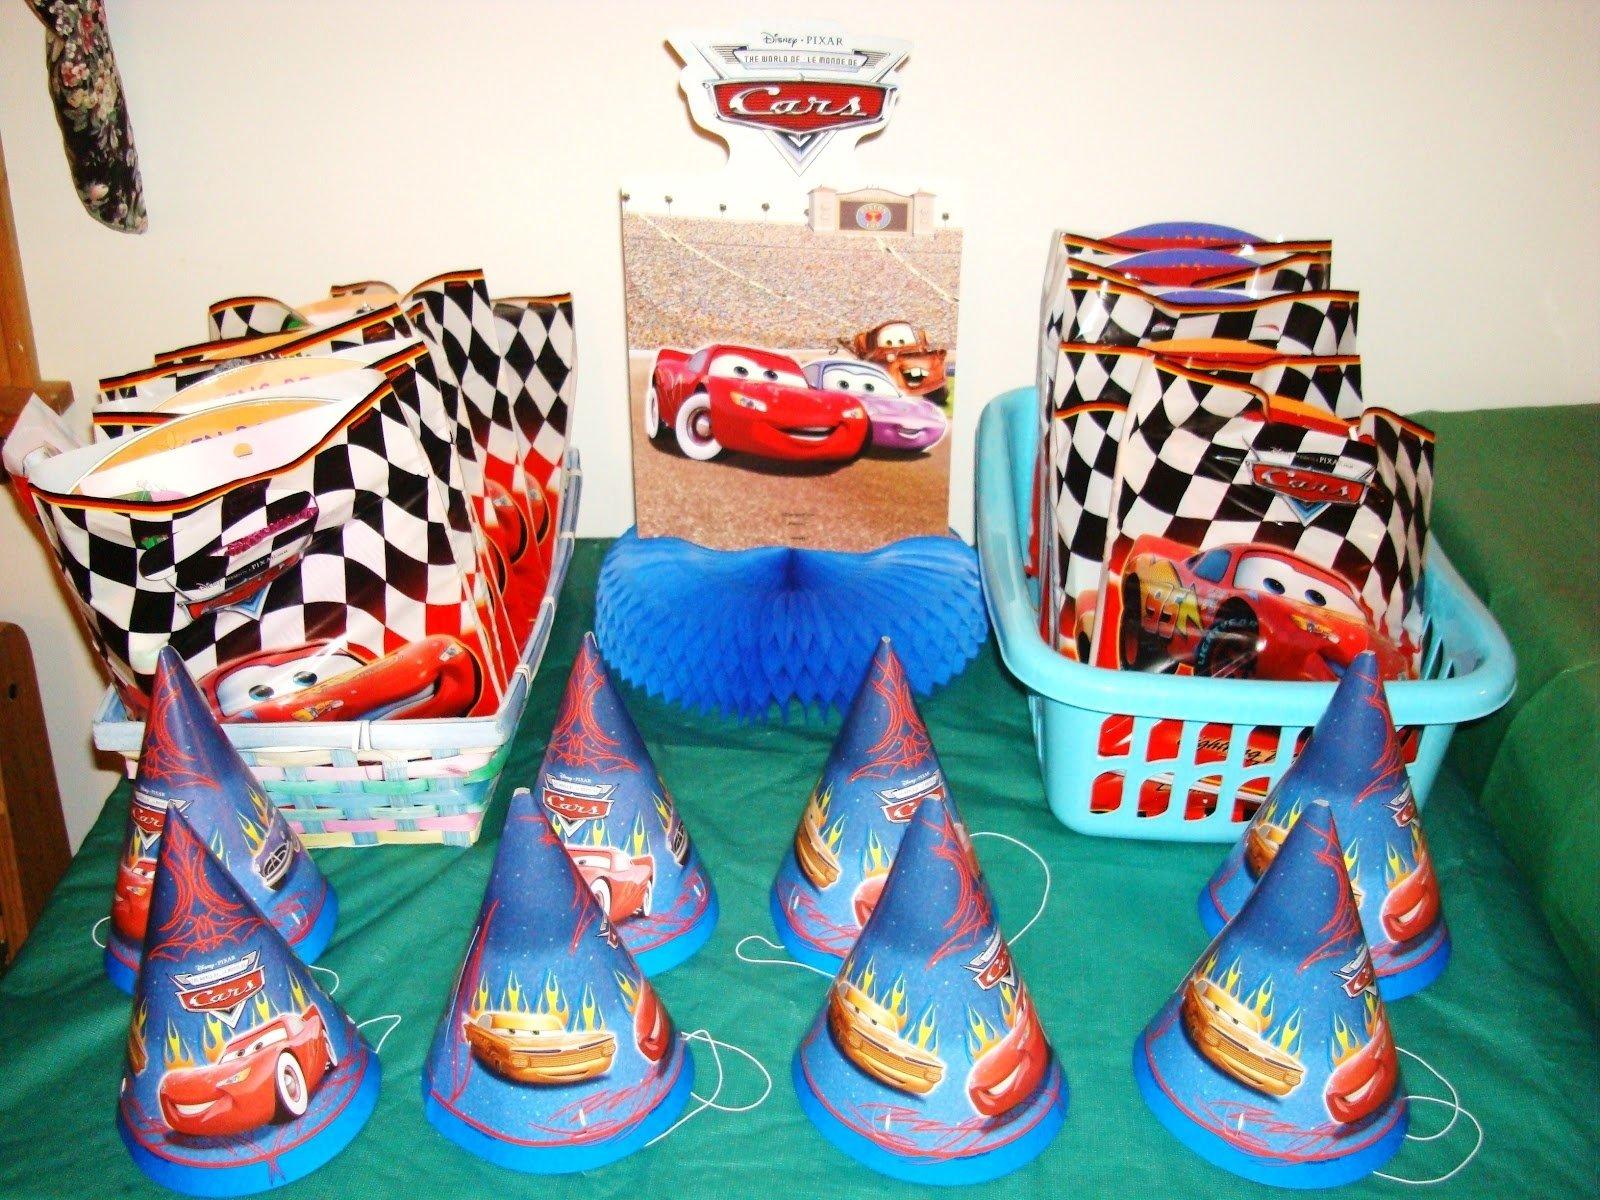 diy disney cars birthday party ideas — criolla brithday & wedding